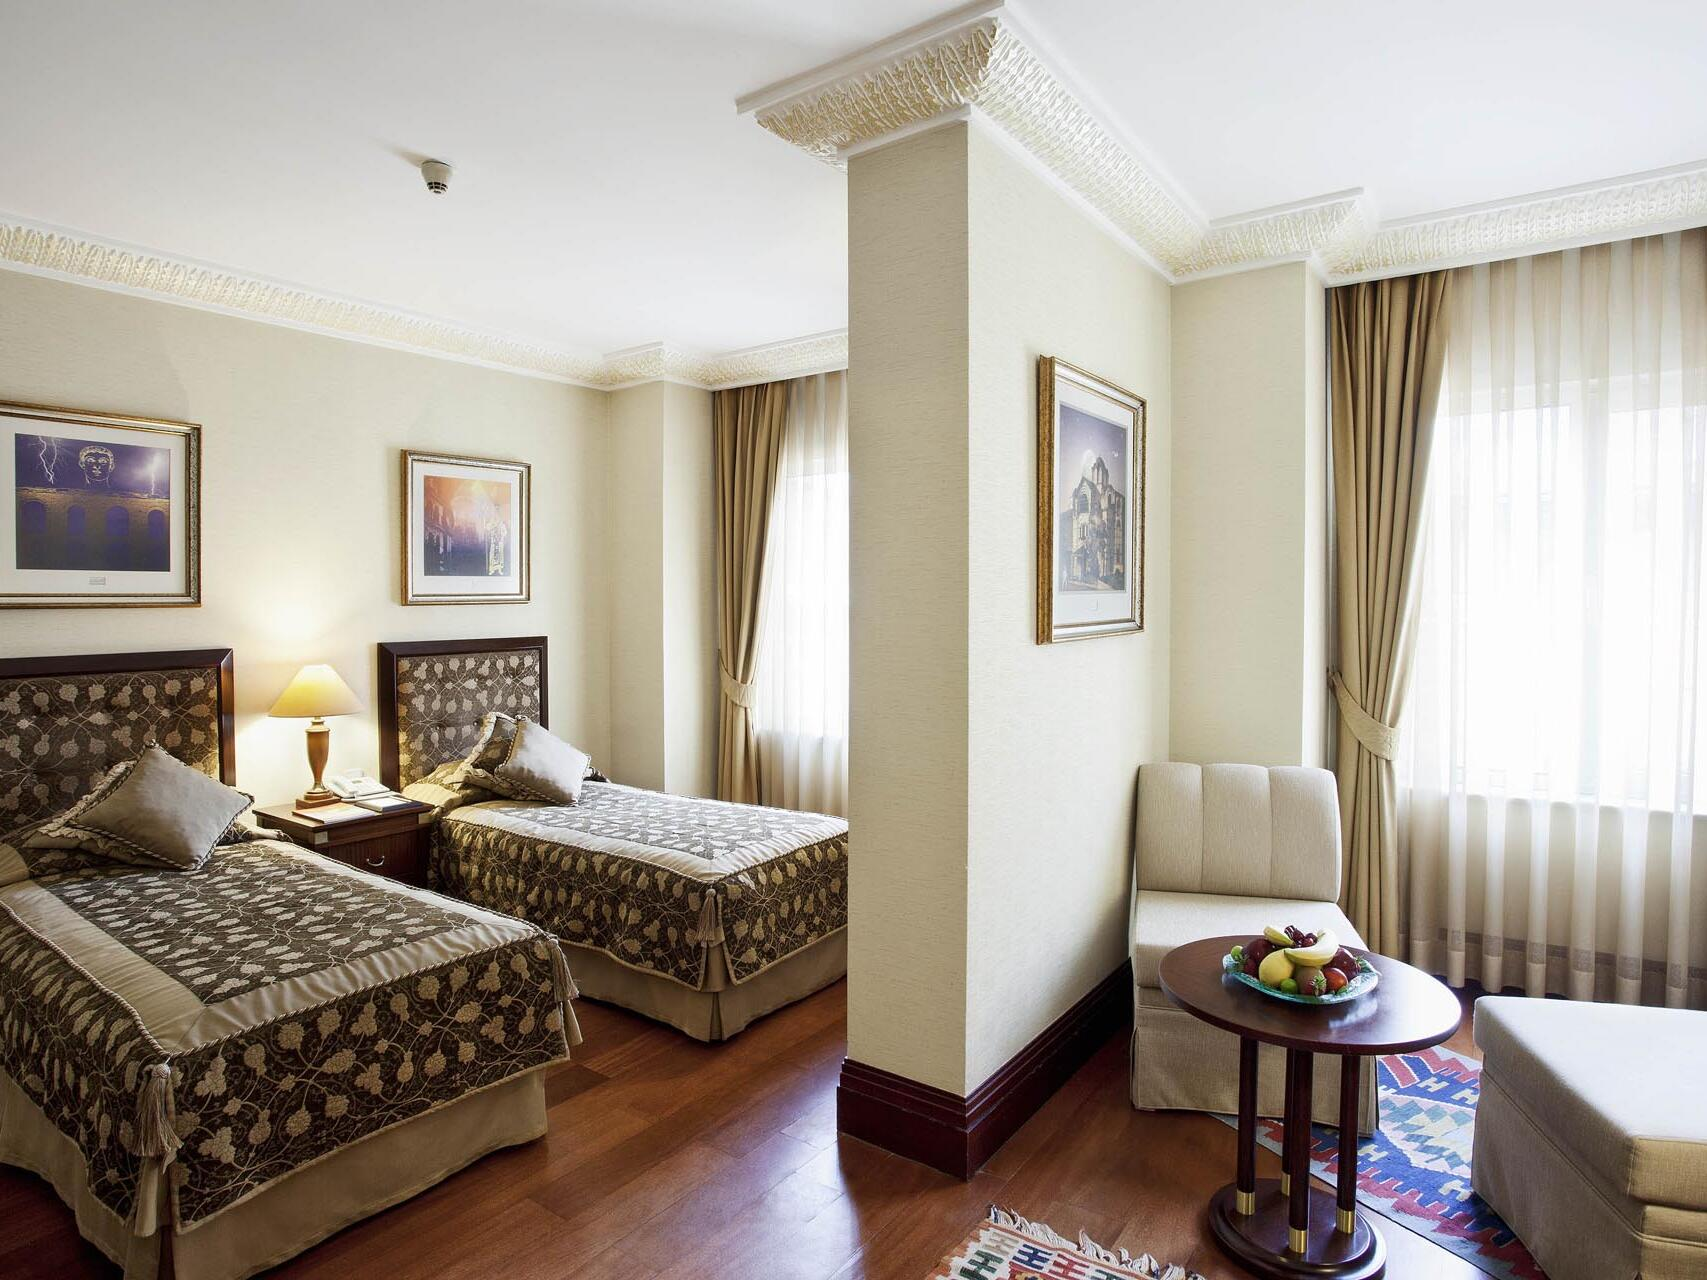 Economy Room Eresin hotels sultanahmet